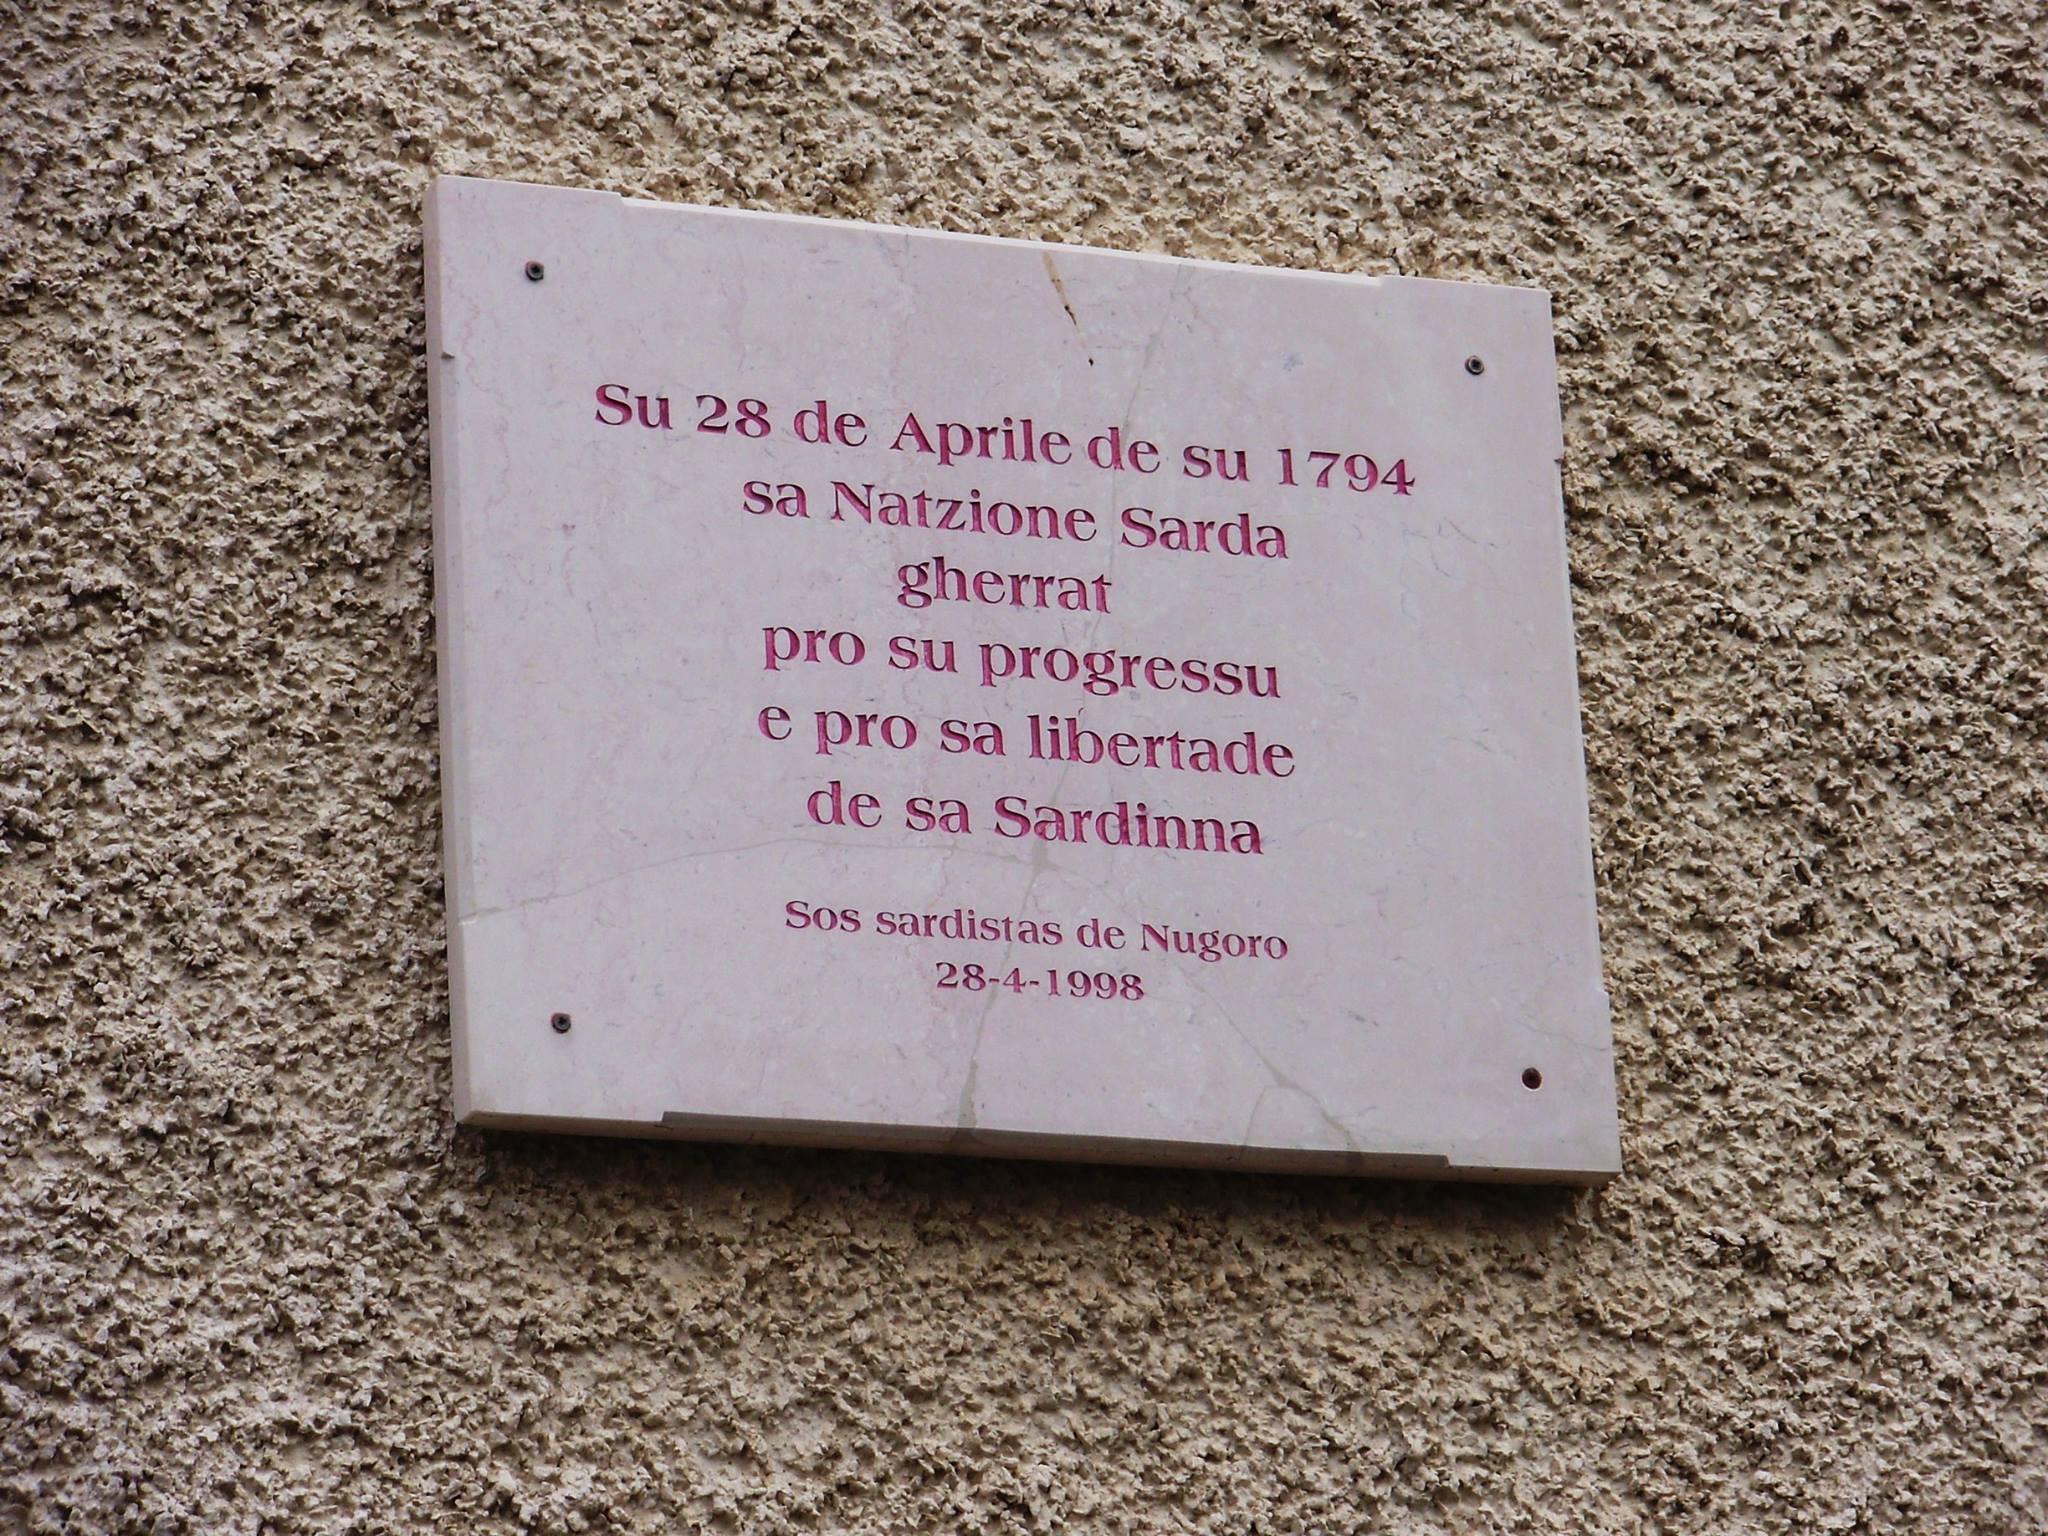 Sa die de sa Sardinia. Targa in Piazza Su Connottu a Nuoro.